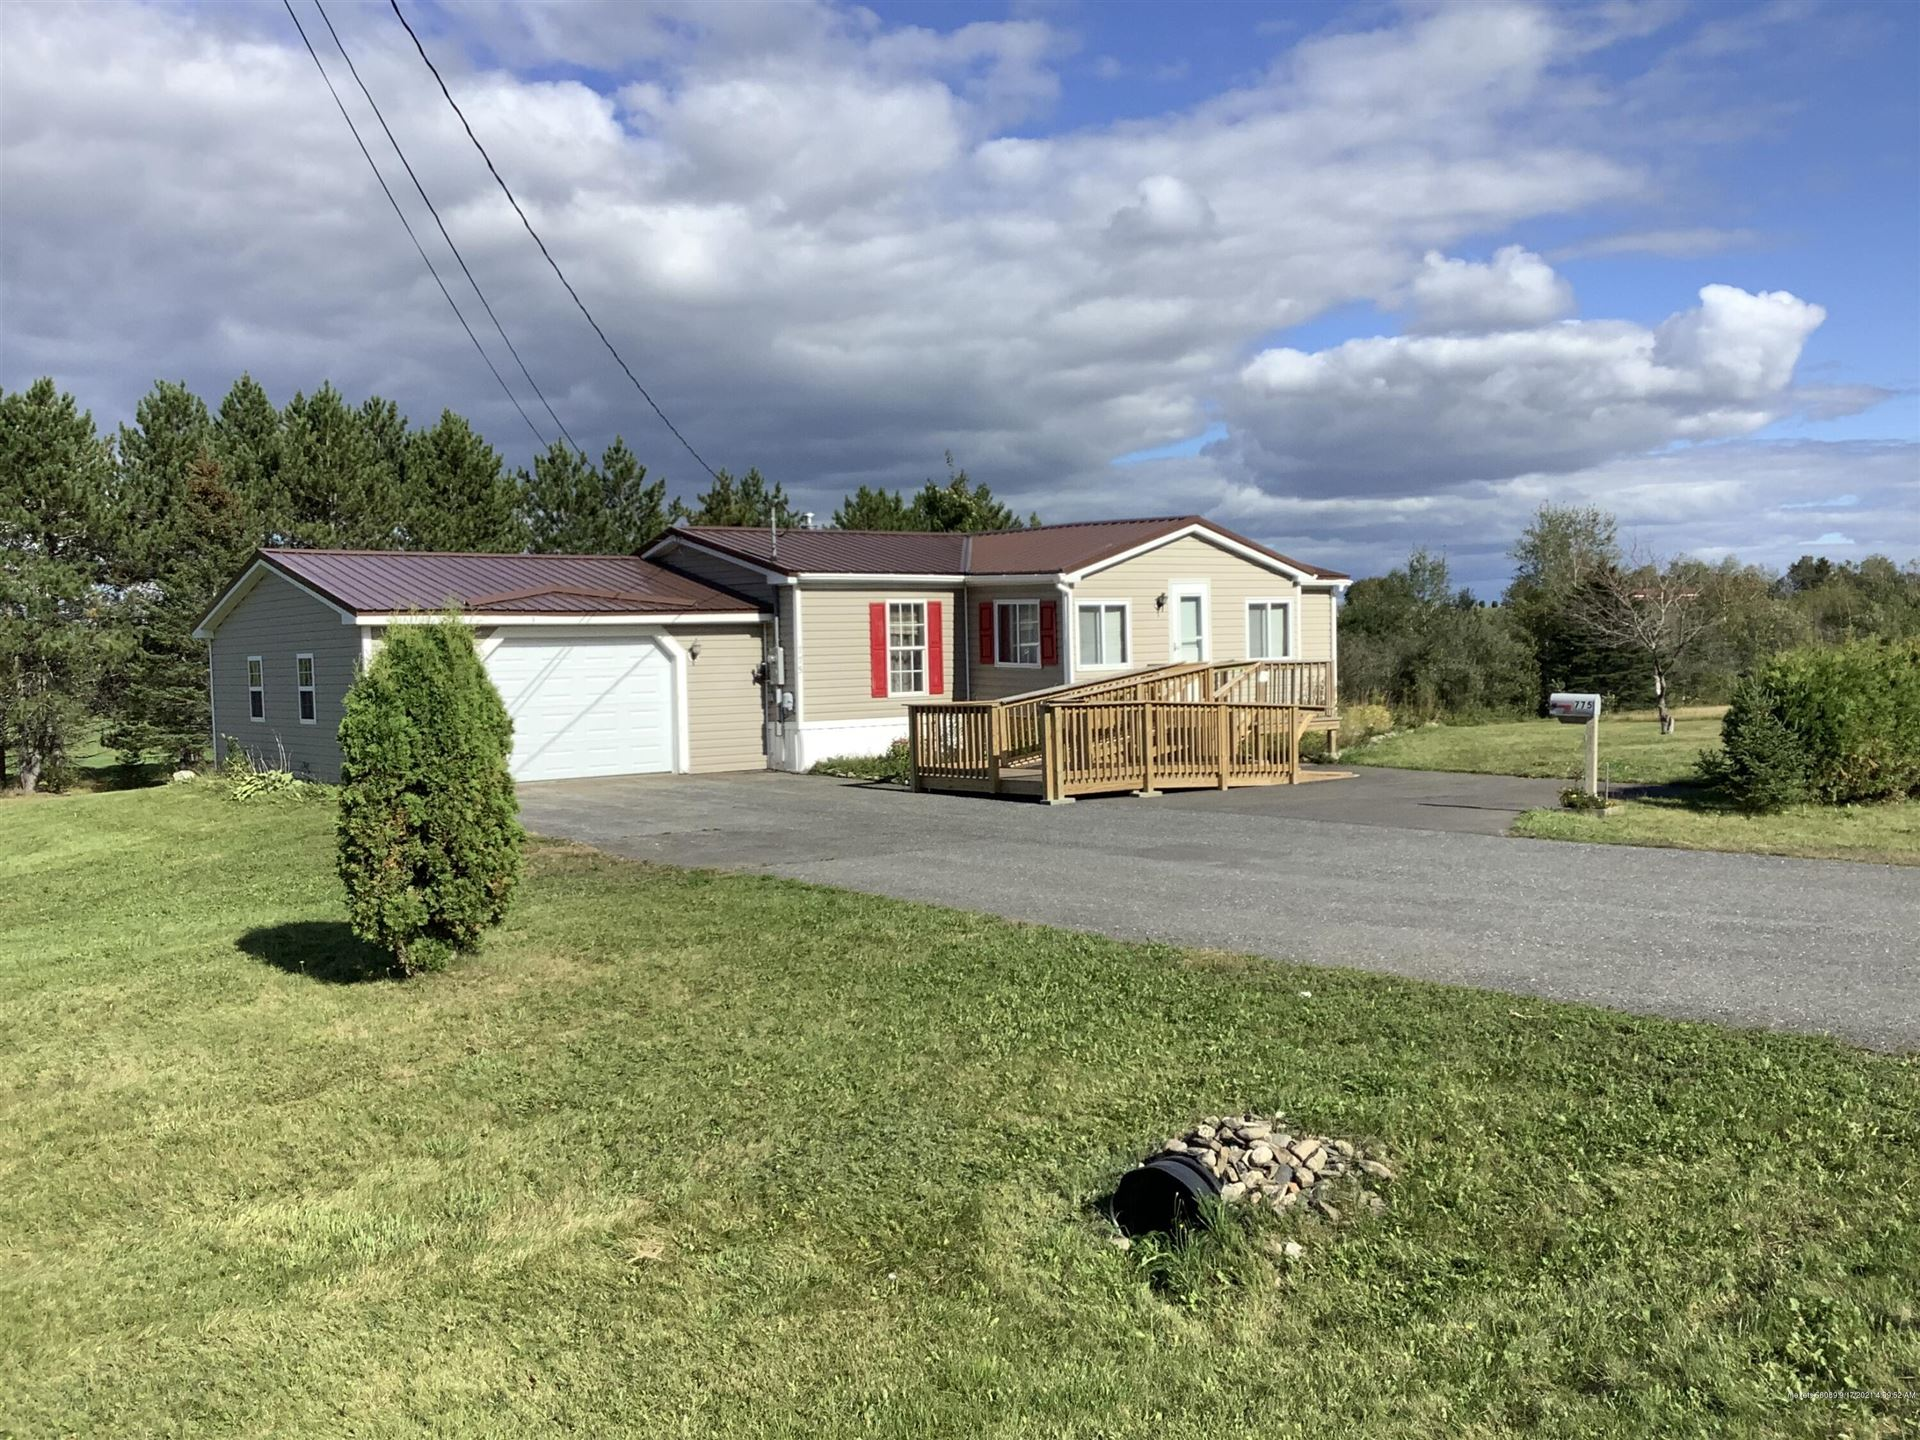 Photo of 775 Sweden Street, Caribou, ME 04736 (MLS # 1509201)